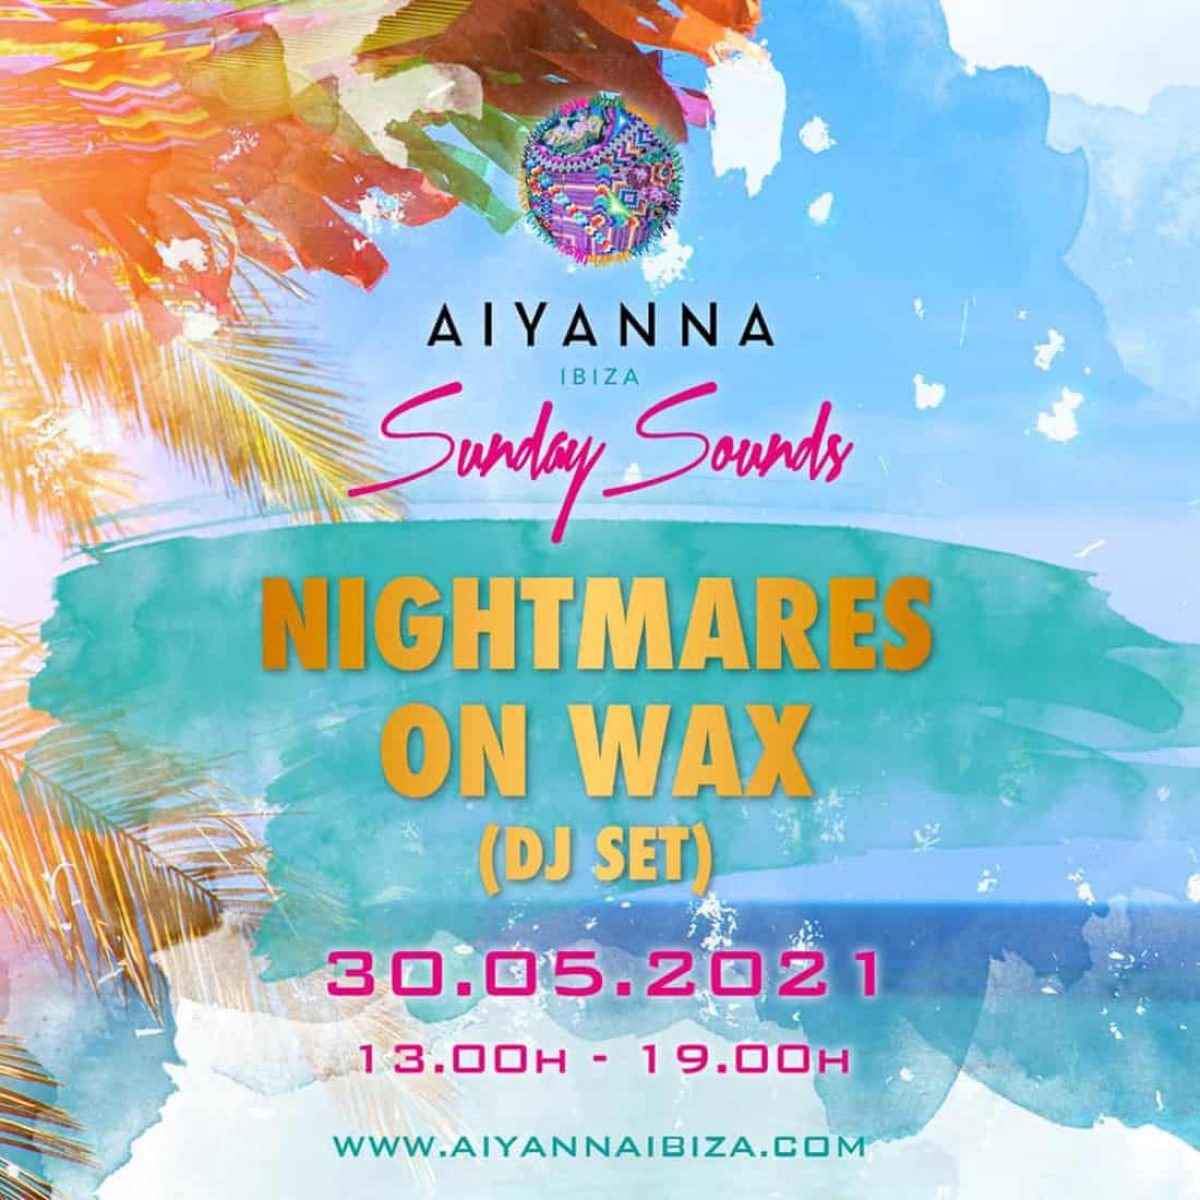 aiyanna-ibiza-zondag-geluiden-nachtmerries-op-wax-2021-welkomtoibiza